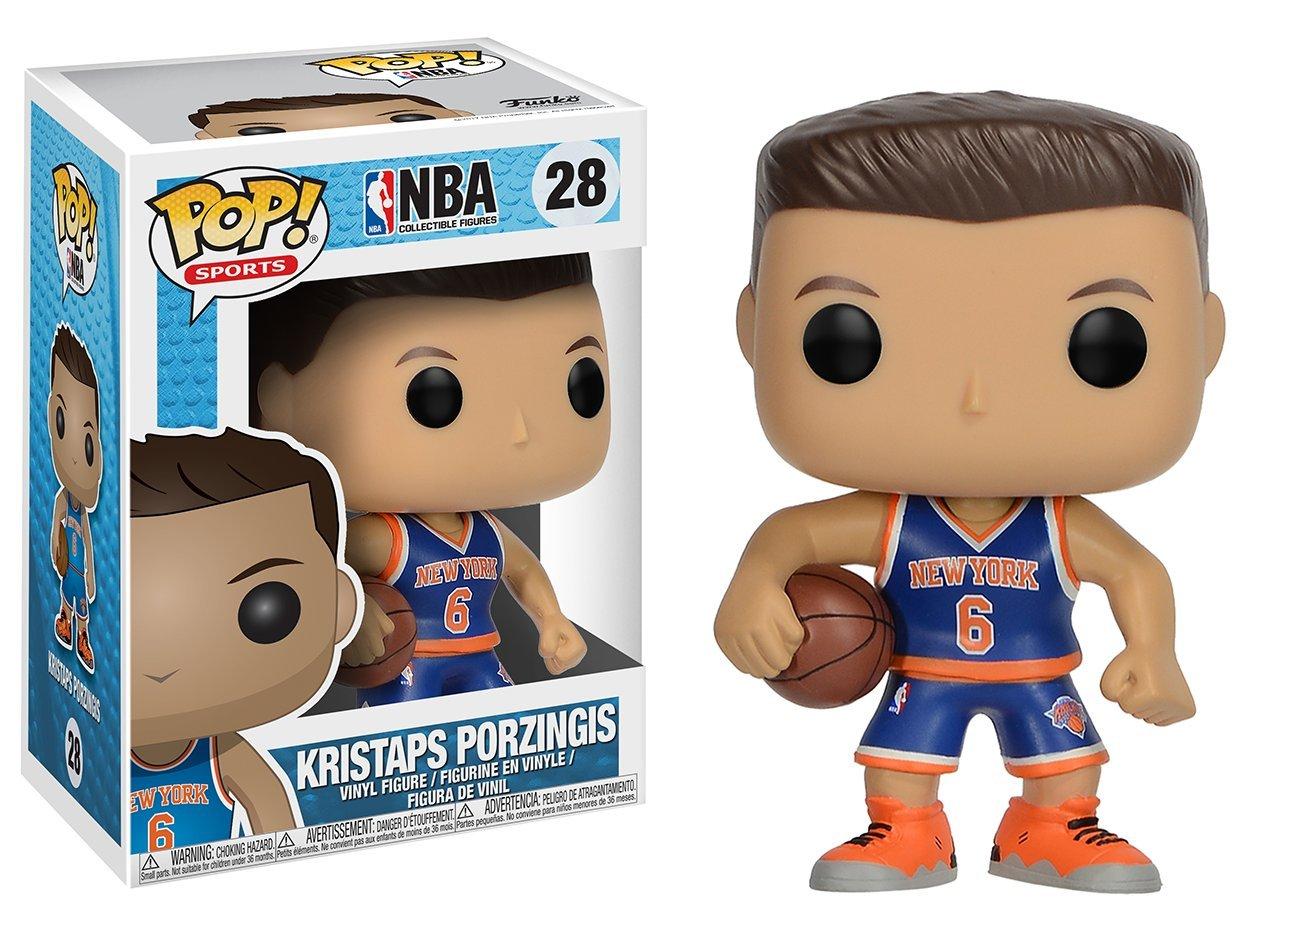 Funko Pop Kristaps Porzingis New York Knicks camiseta azul (NBA 28) Funko Pop NBA